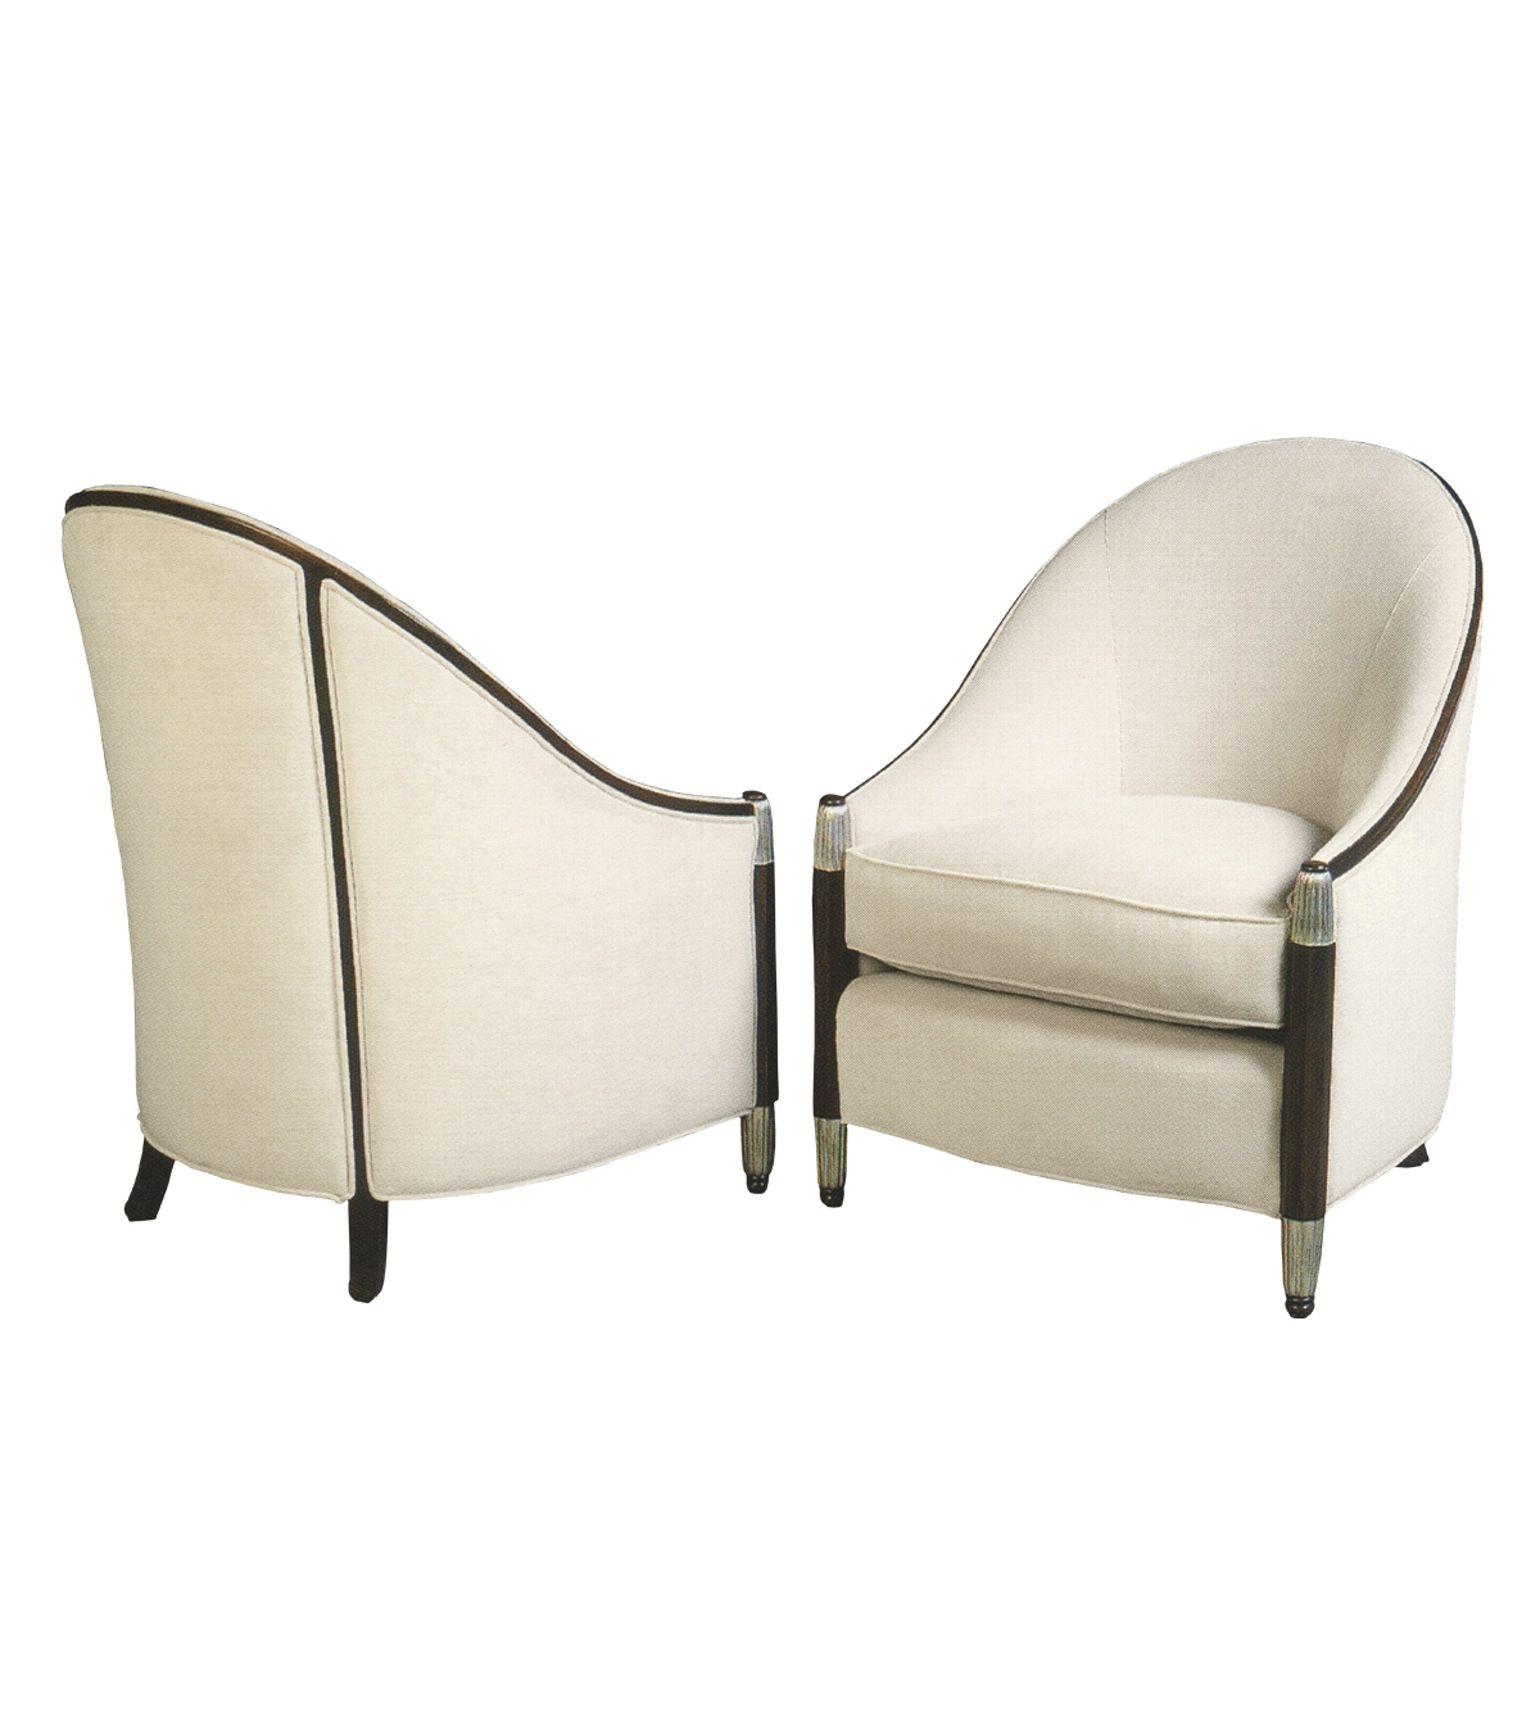 Attrayant Art Deco Lounge Chair